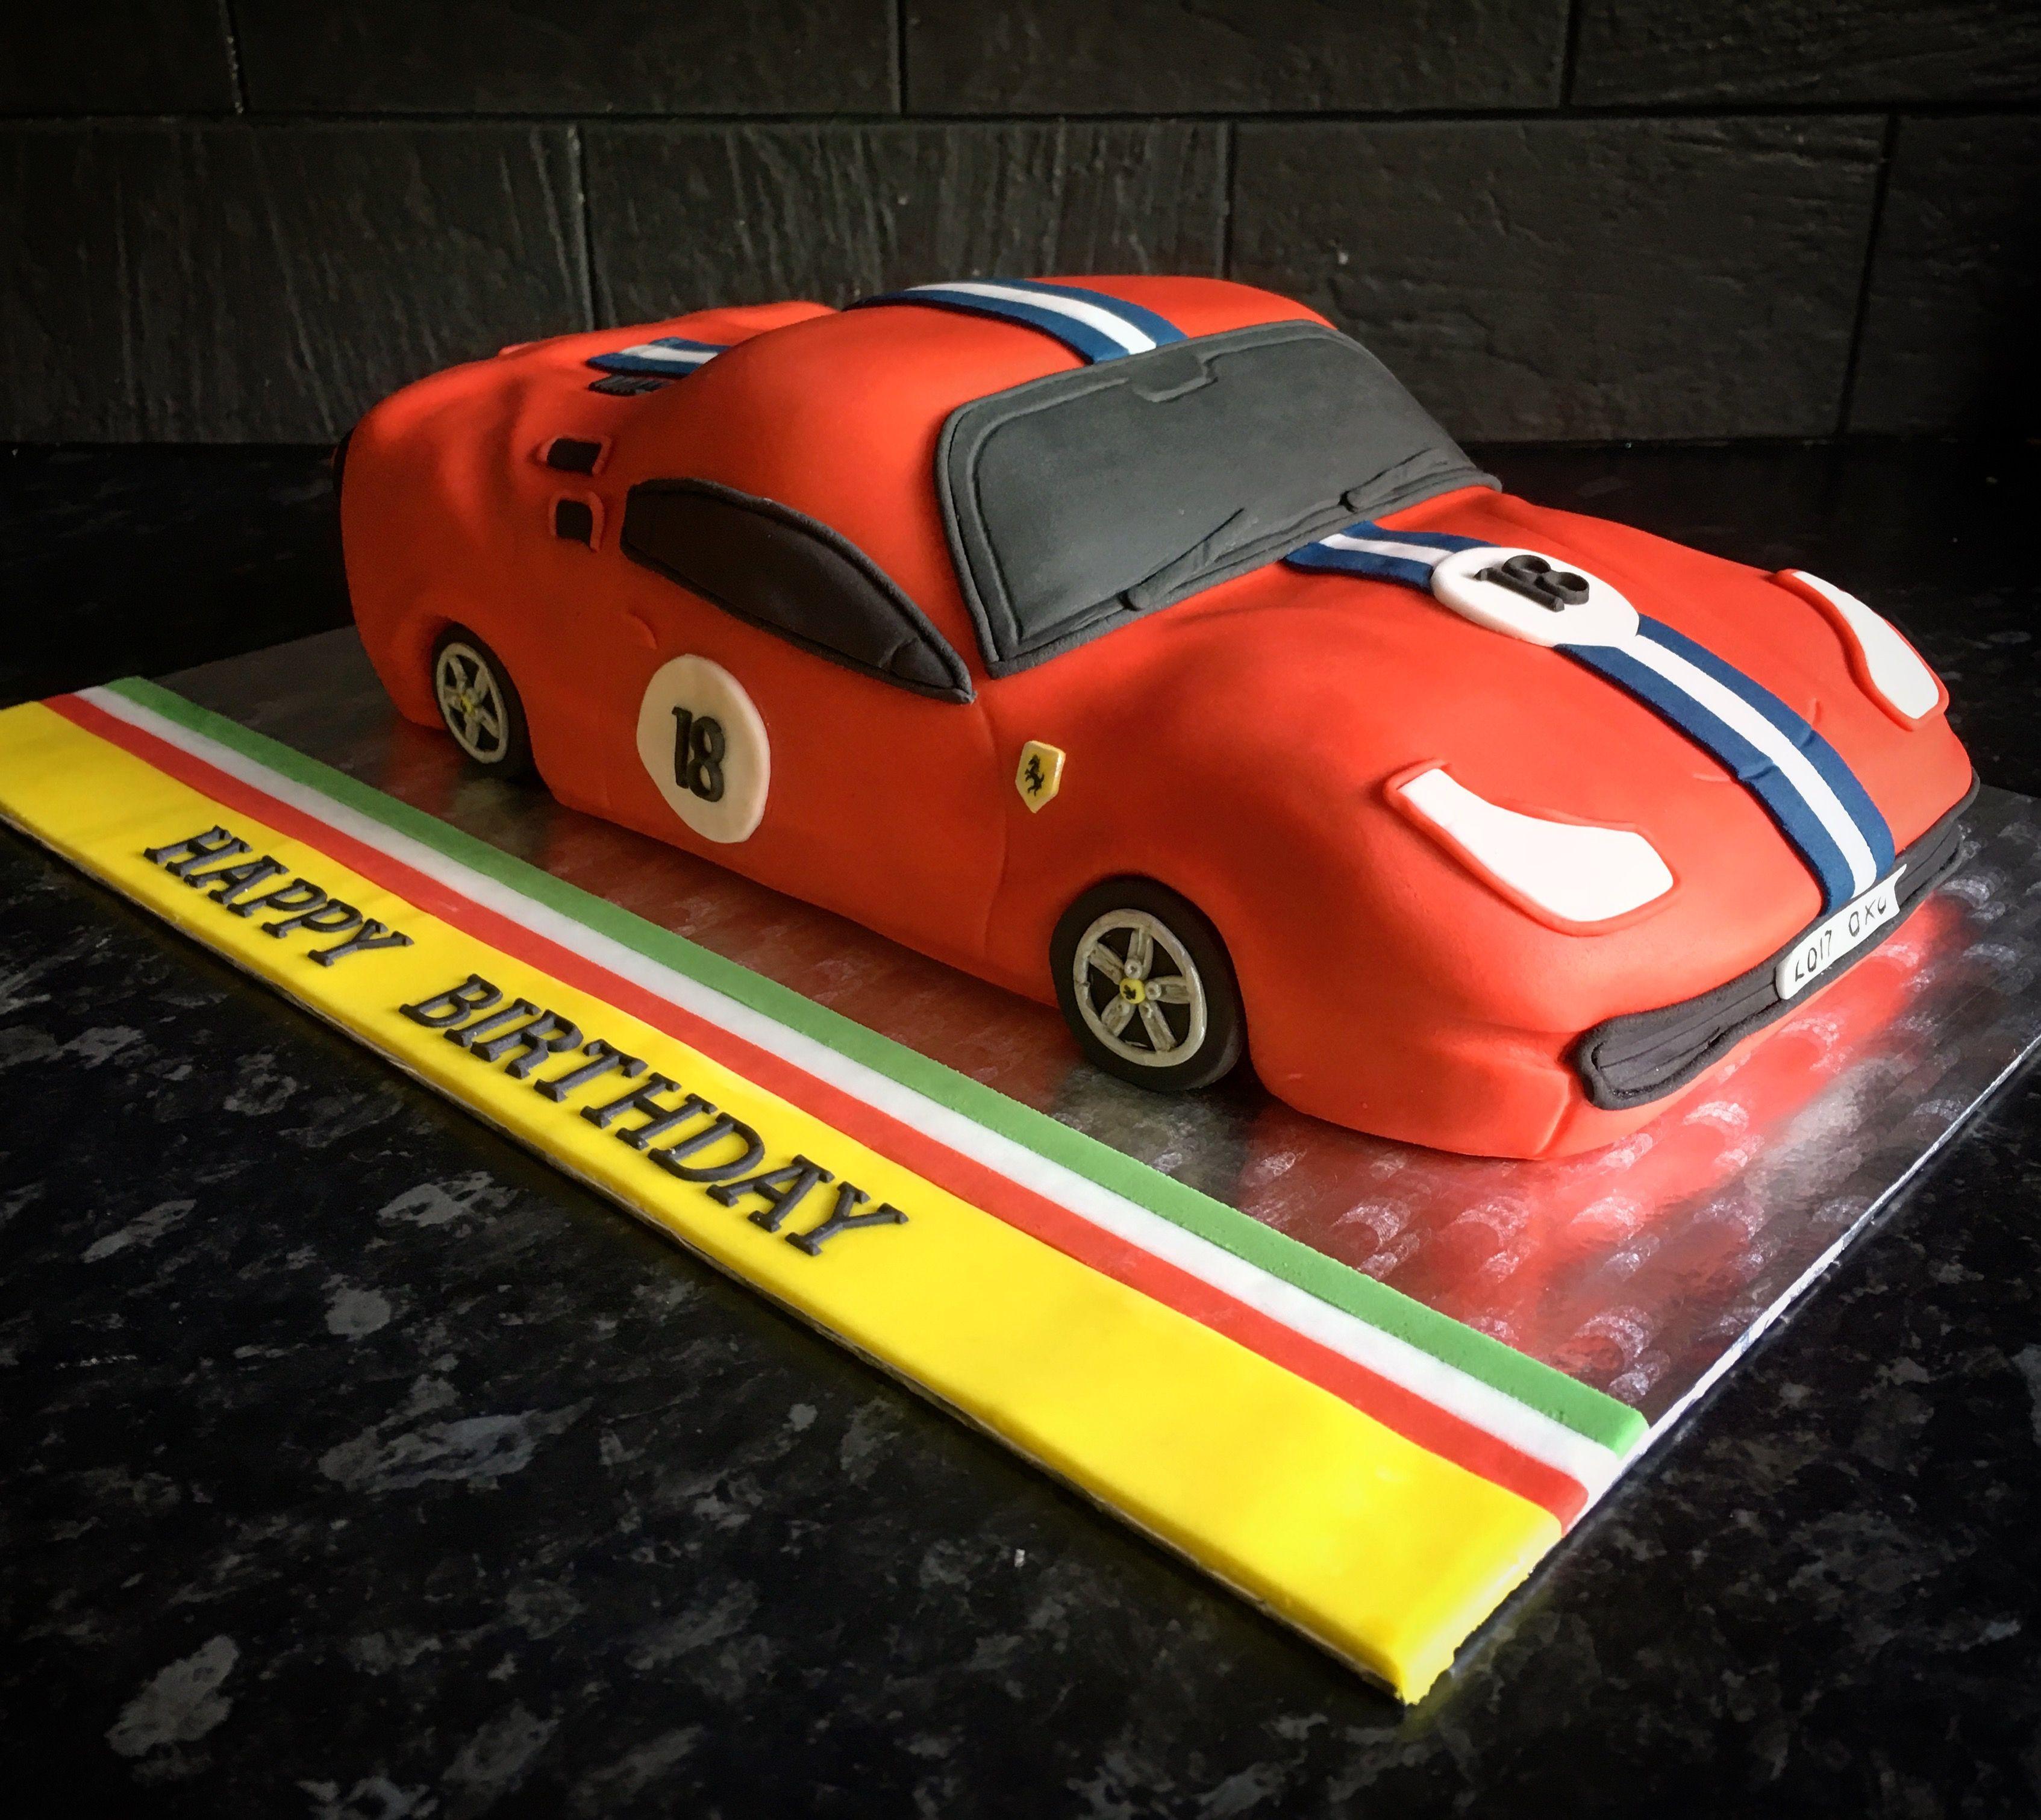 Ferrari shaped birthday cake first shaped car cake ive made my ferrari shaped birthday cake first shaped car cake ive made baditri Gallery